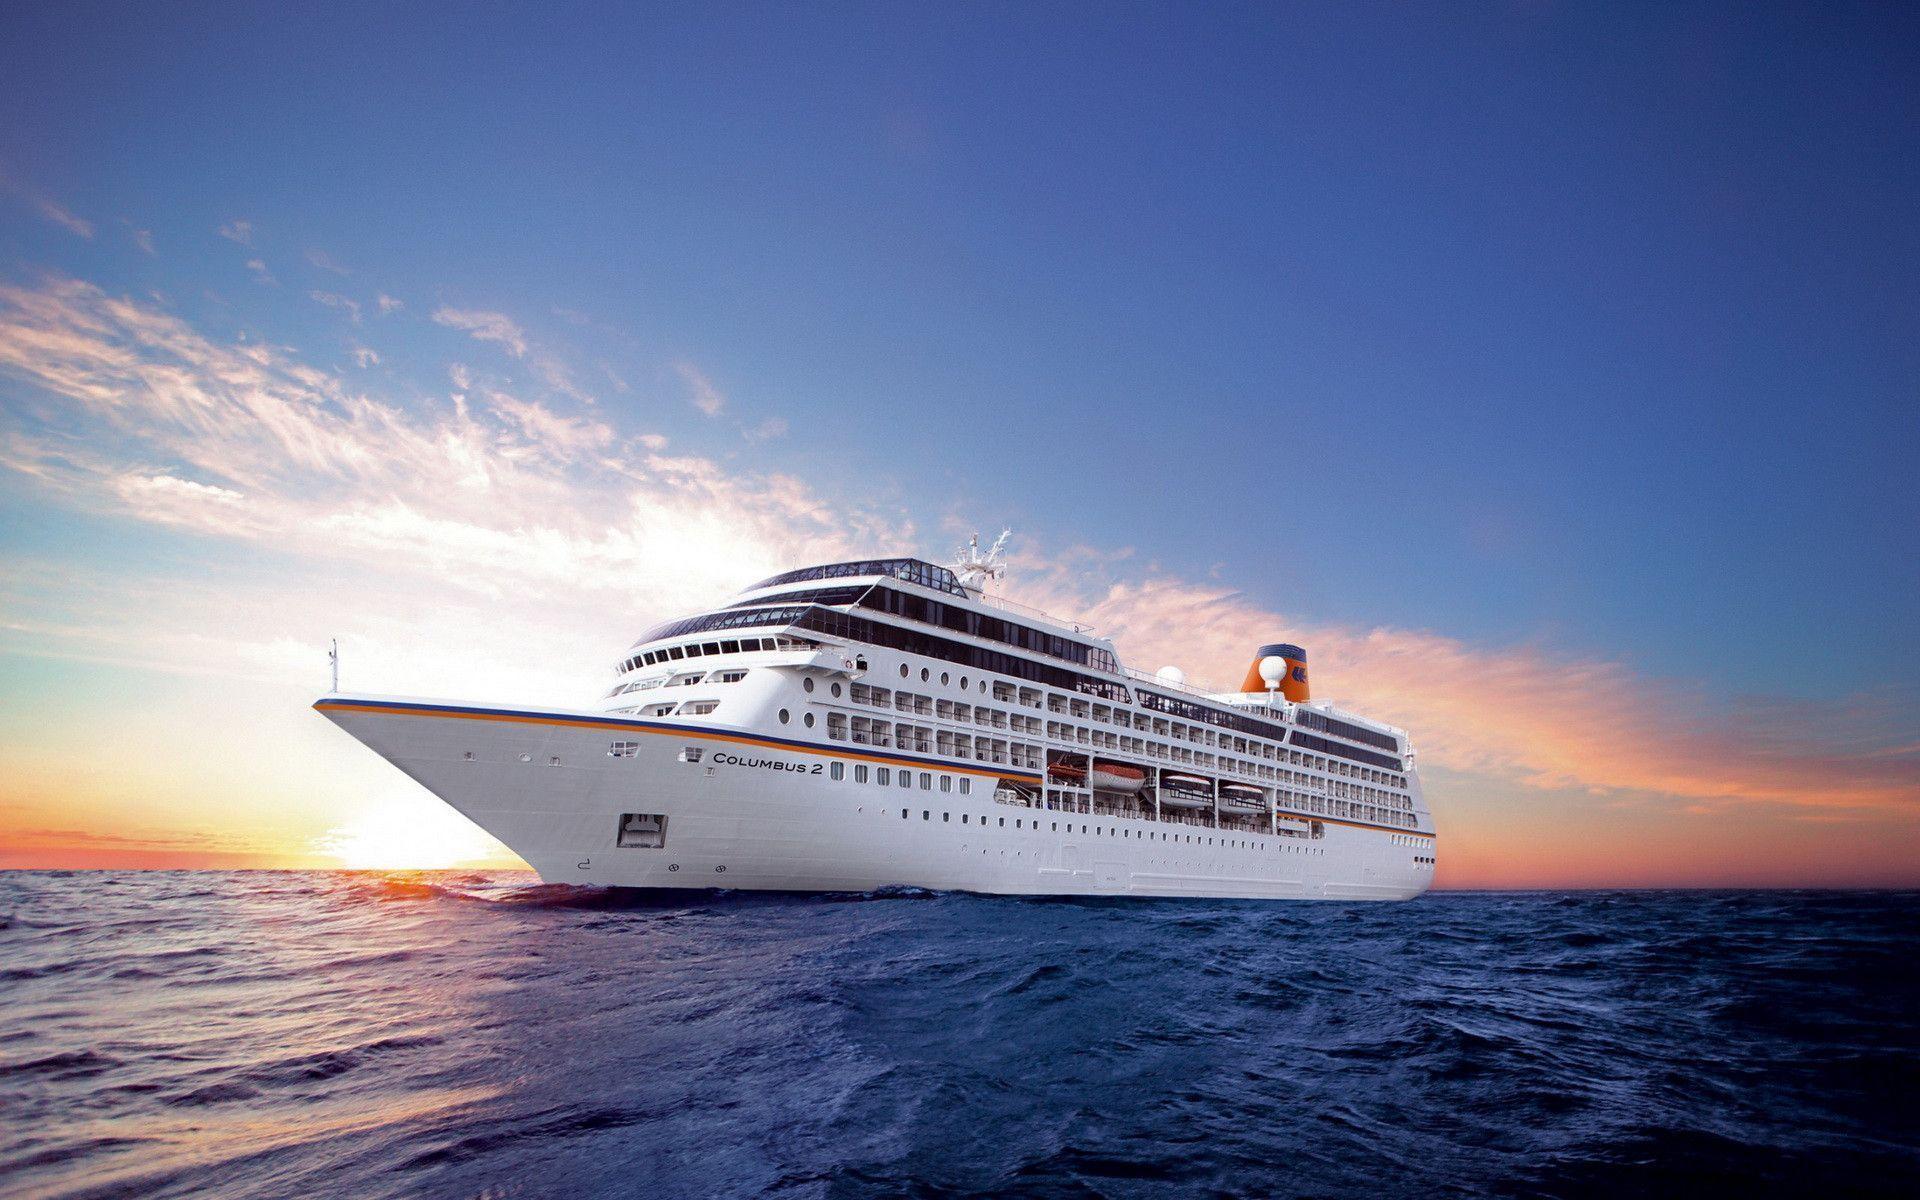 Cruise Ship Wallpapers Wallpaper